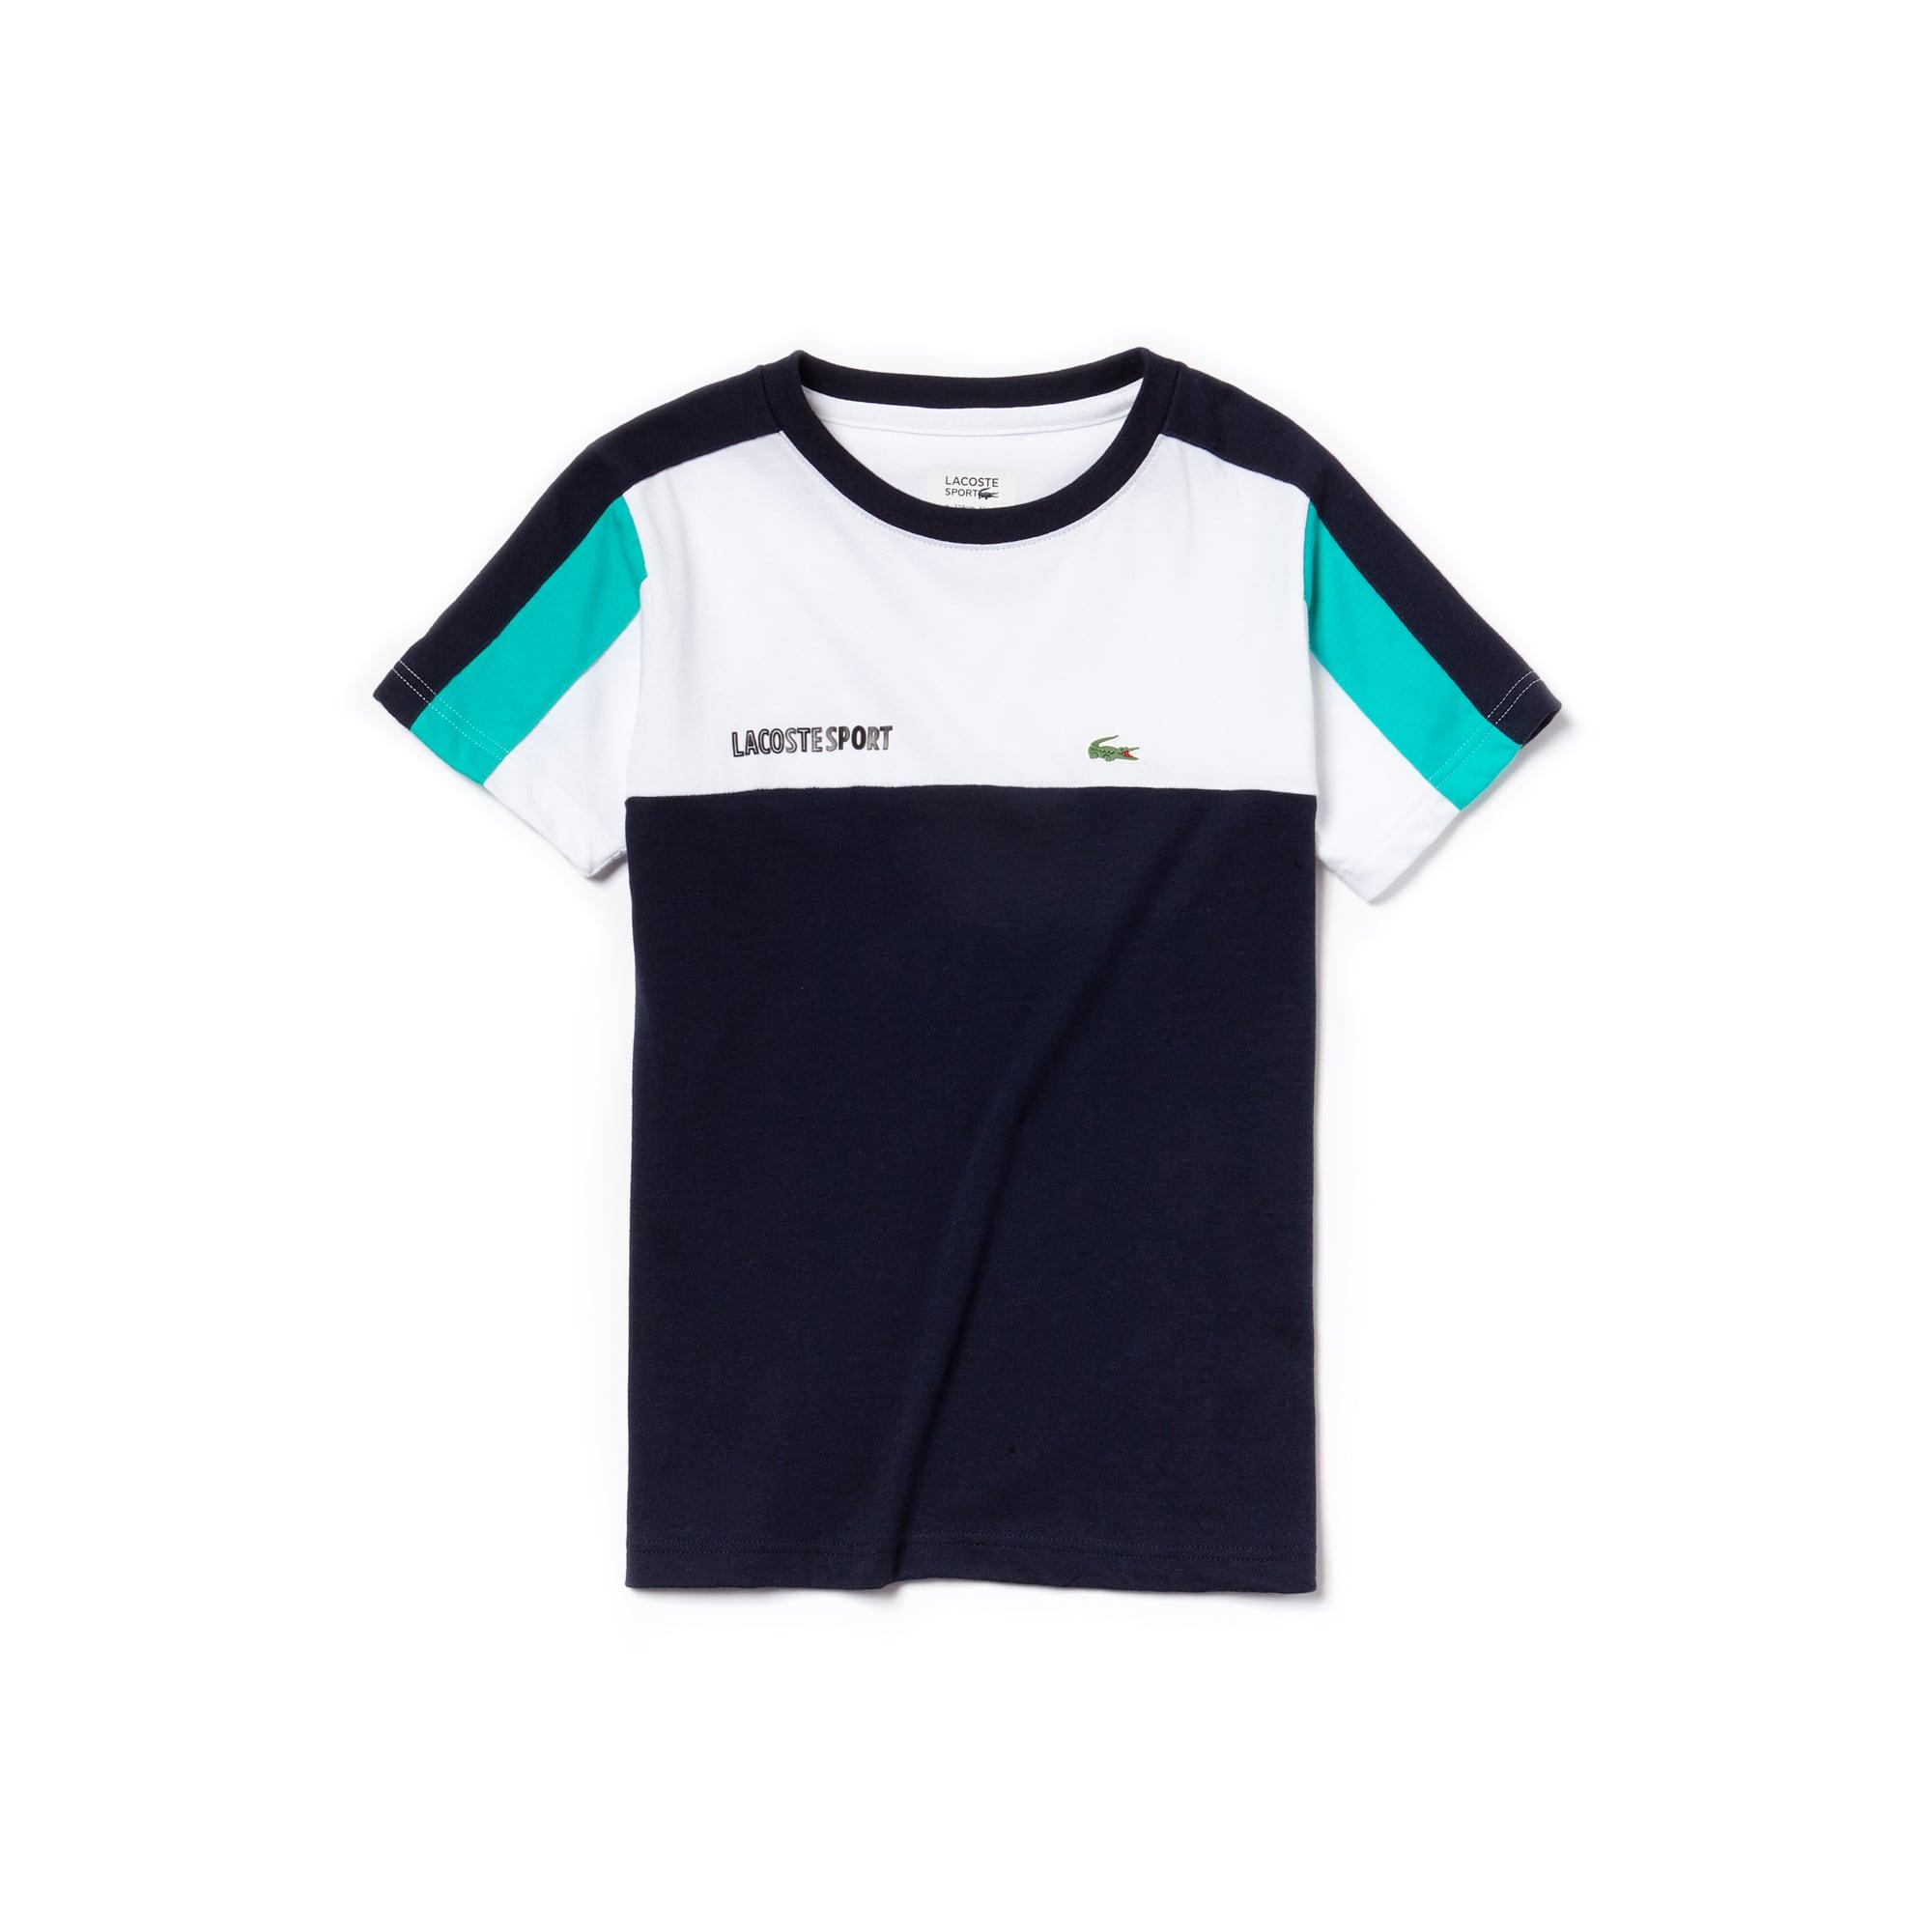 Boys' Lacoste SPORT Crew Neck Colorblock Jersey Tennis T-shirt